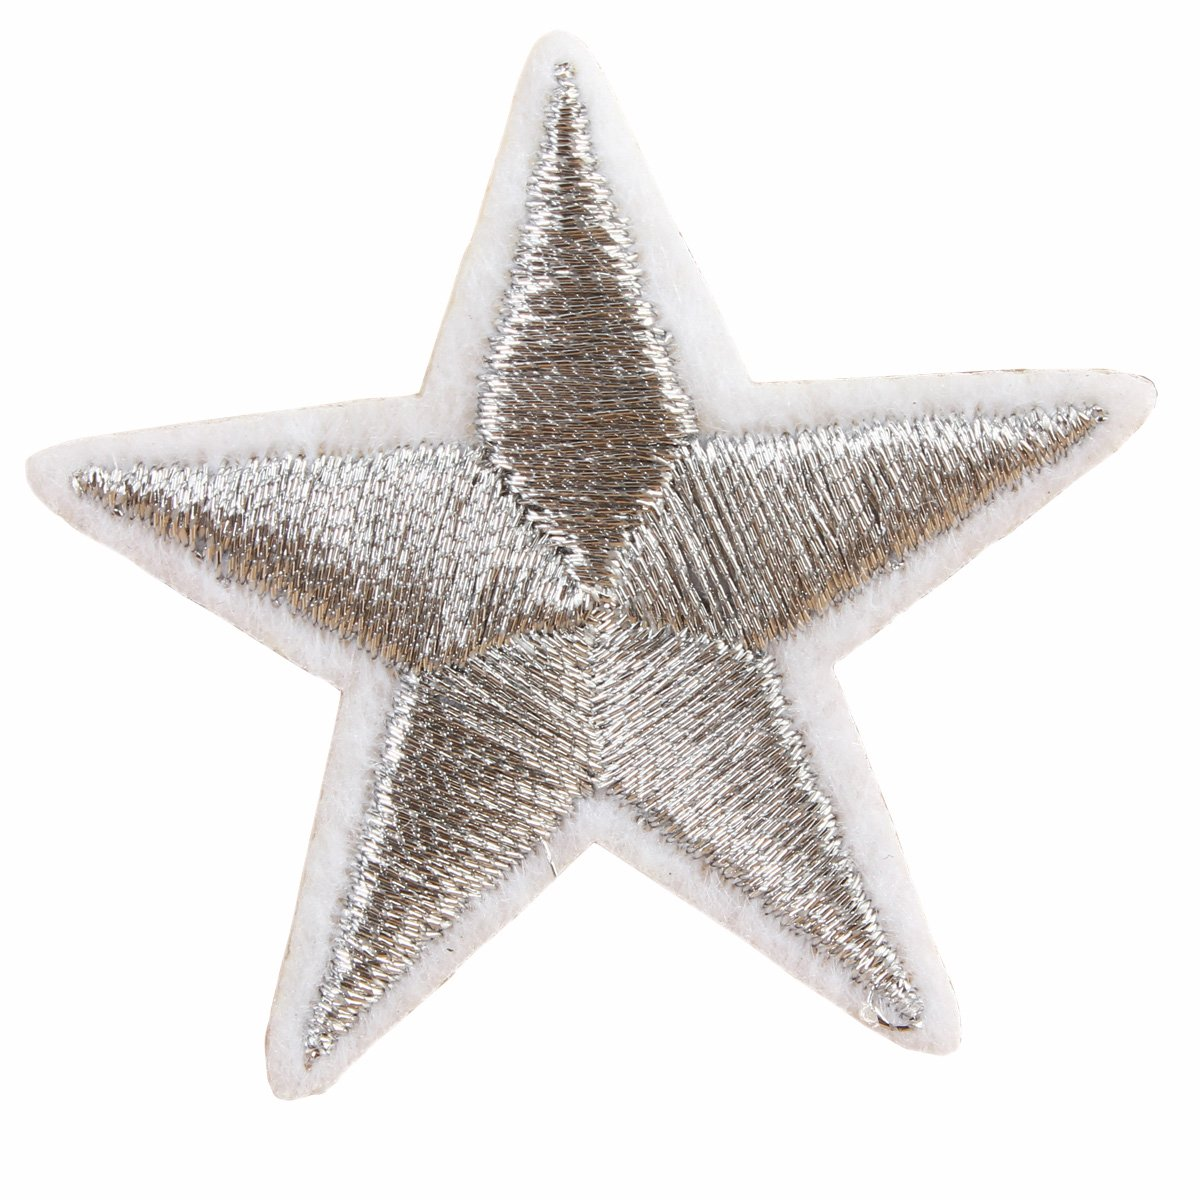 20/pcs 4,2/cm plata cinco estrella para coser en parches bordado gamuza zapatos sombreros bolsas pasta de hierro en parches